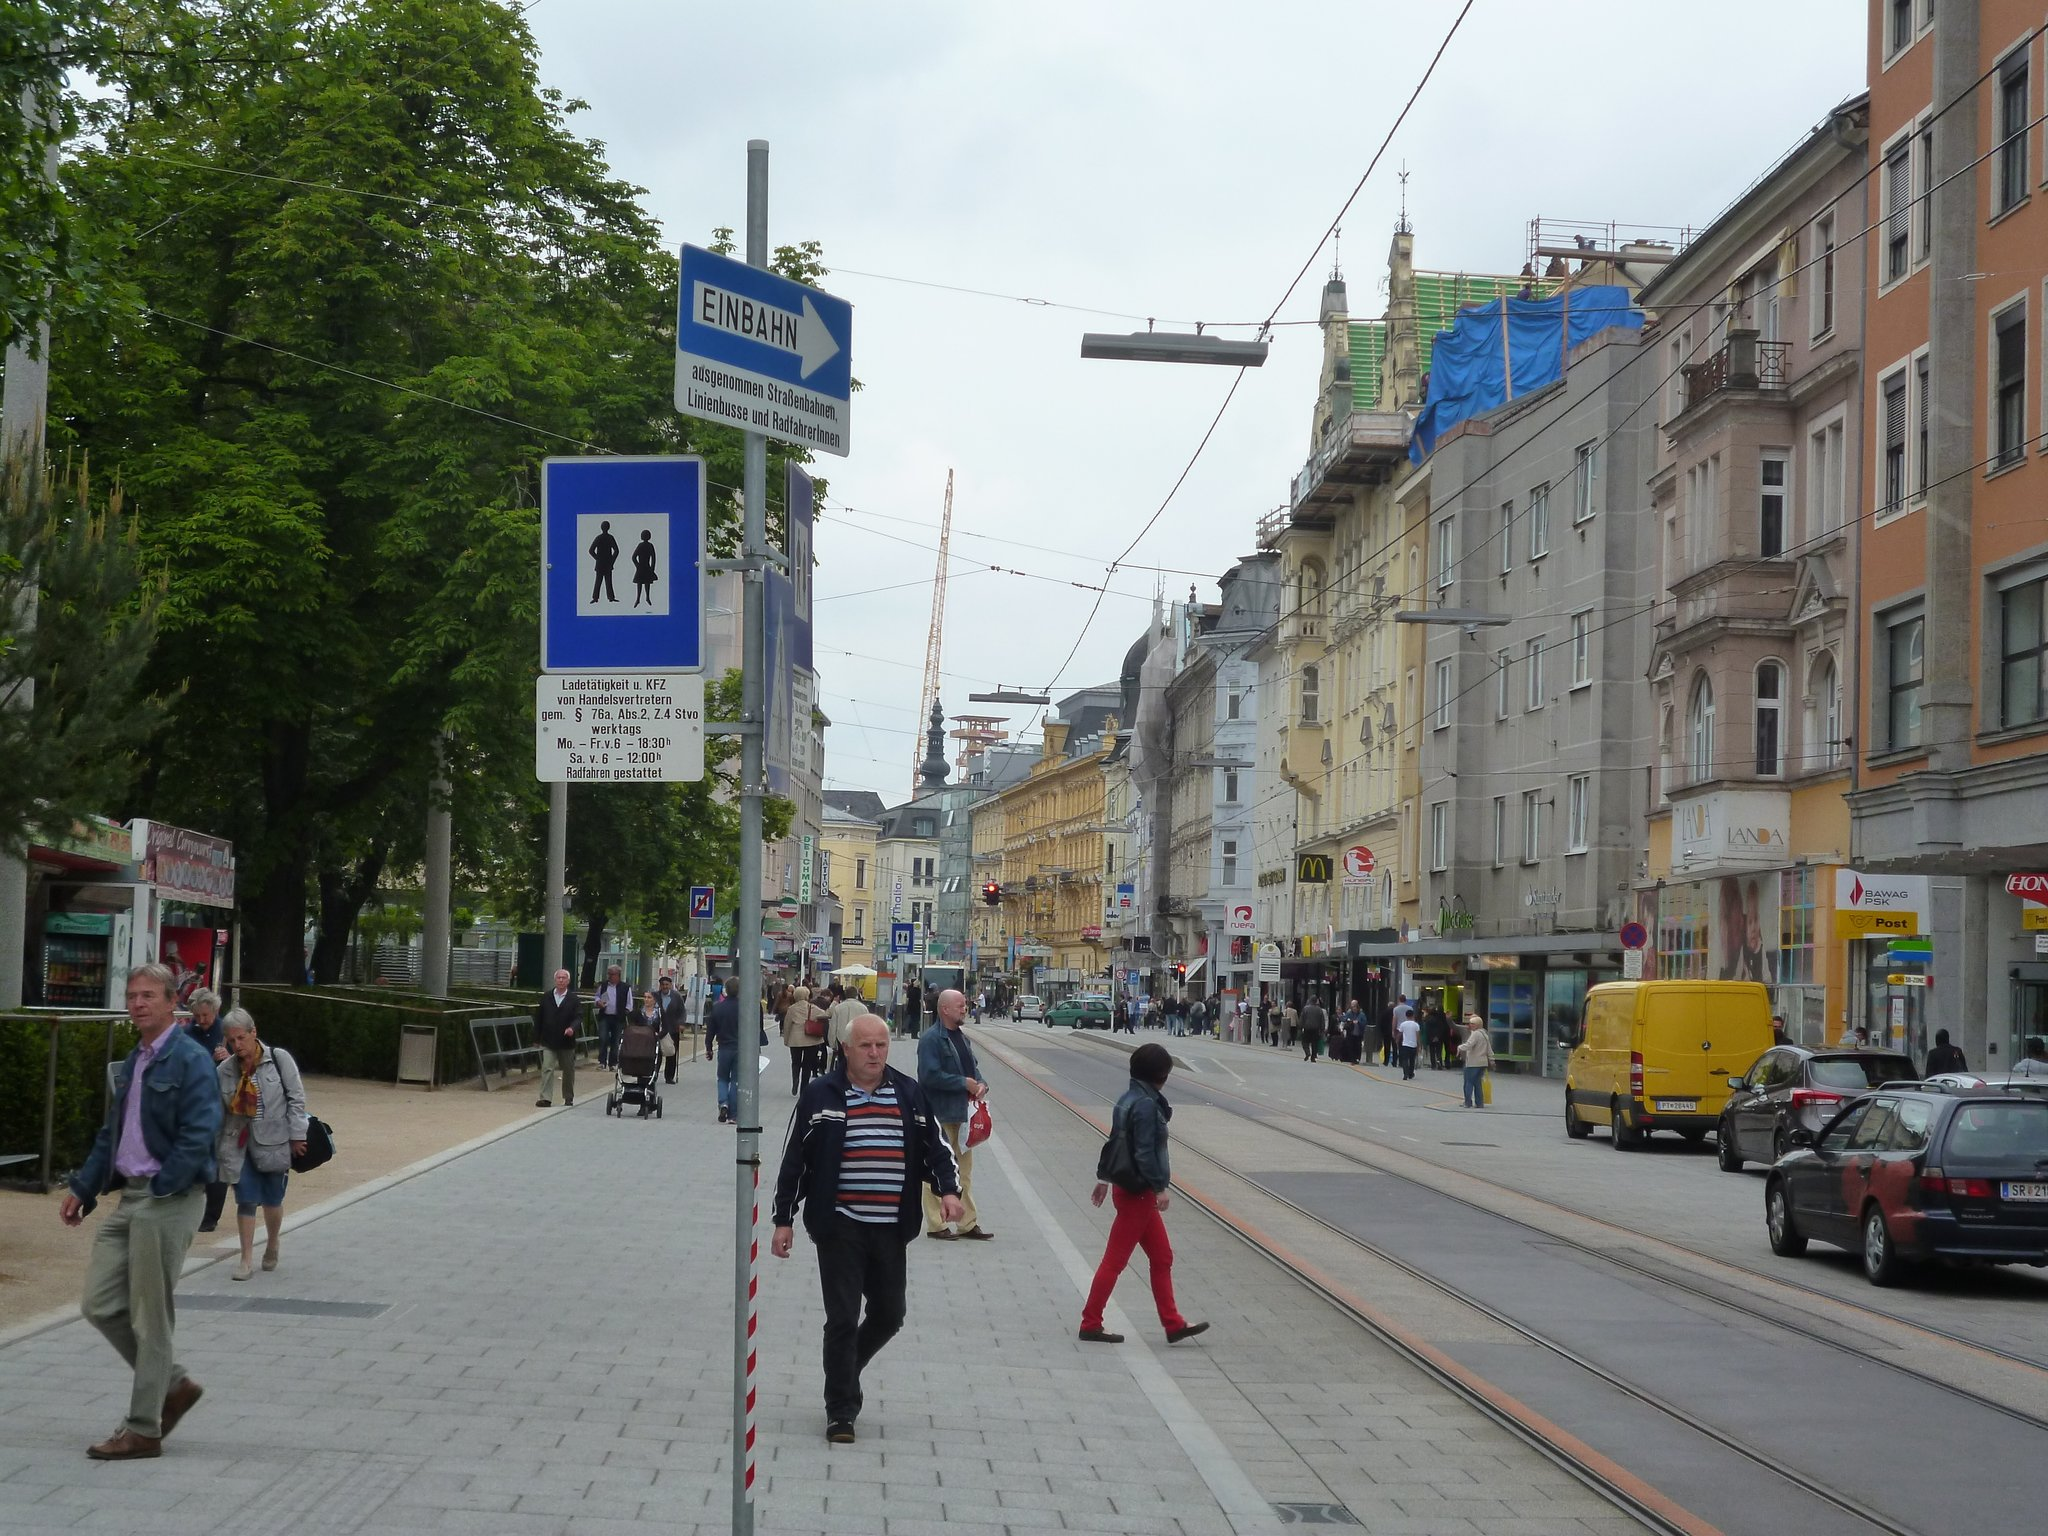 Geschäfte österreich Geschlossen